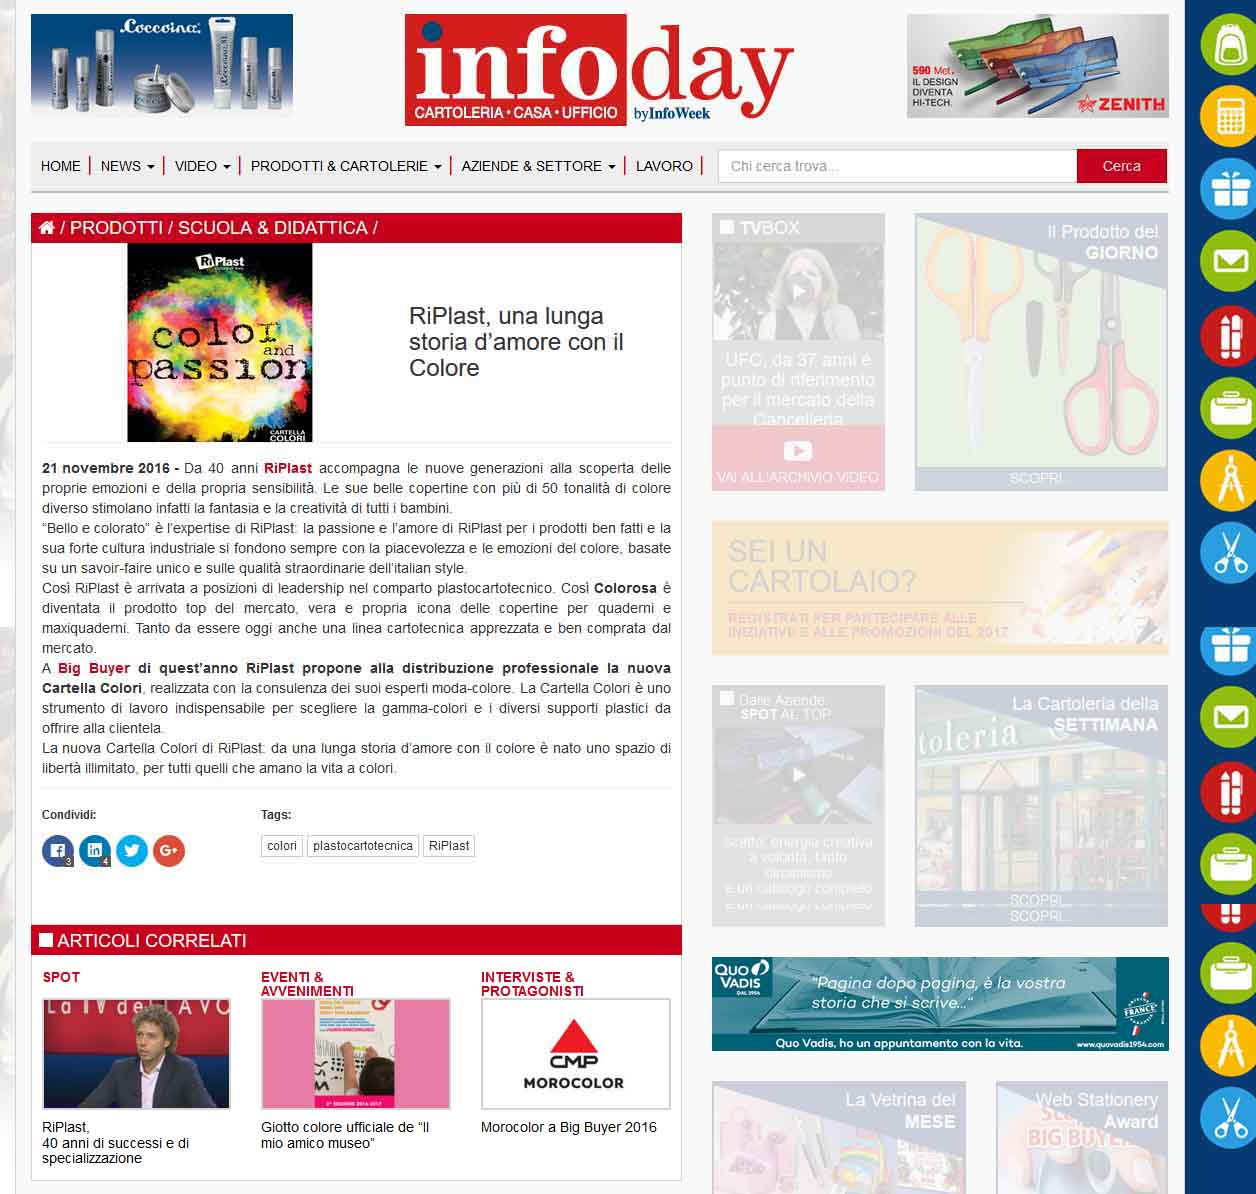 www-infoday-it-nuova-cartella-colori